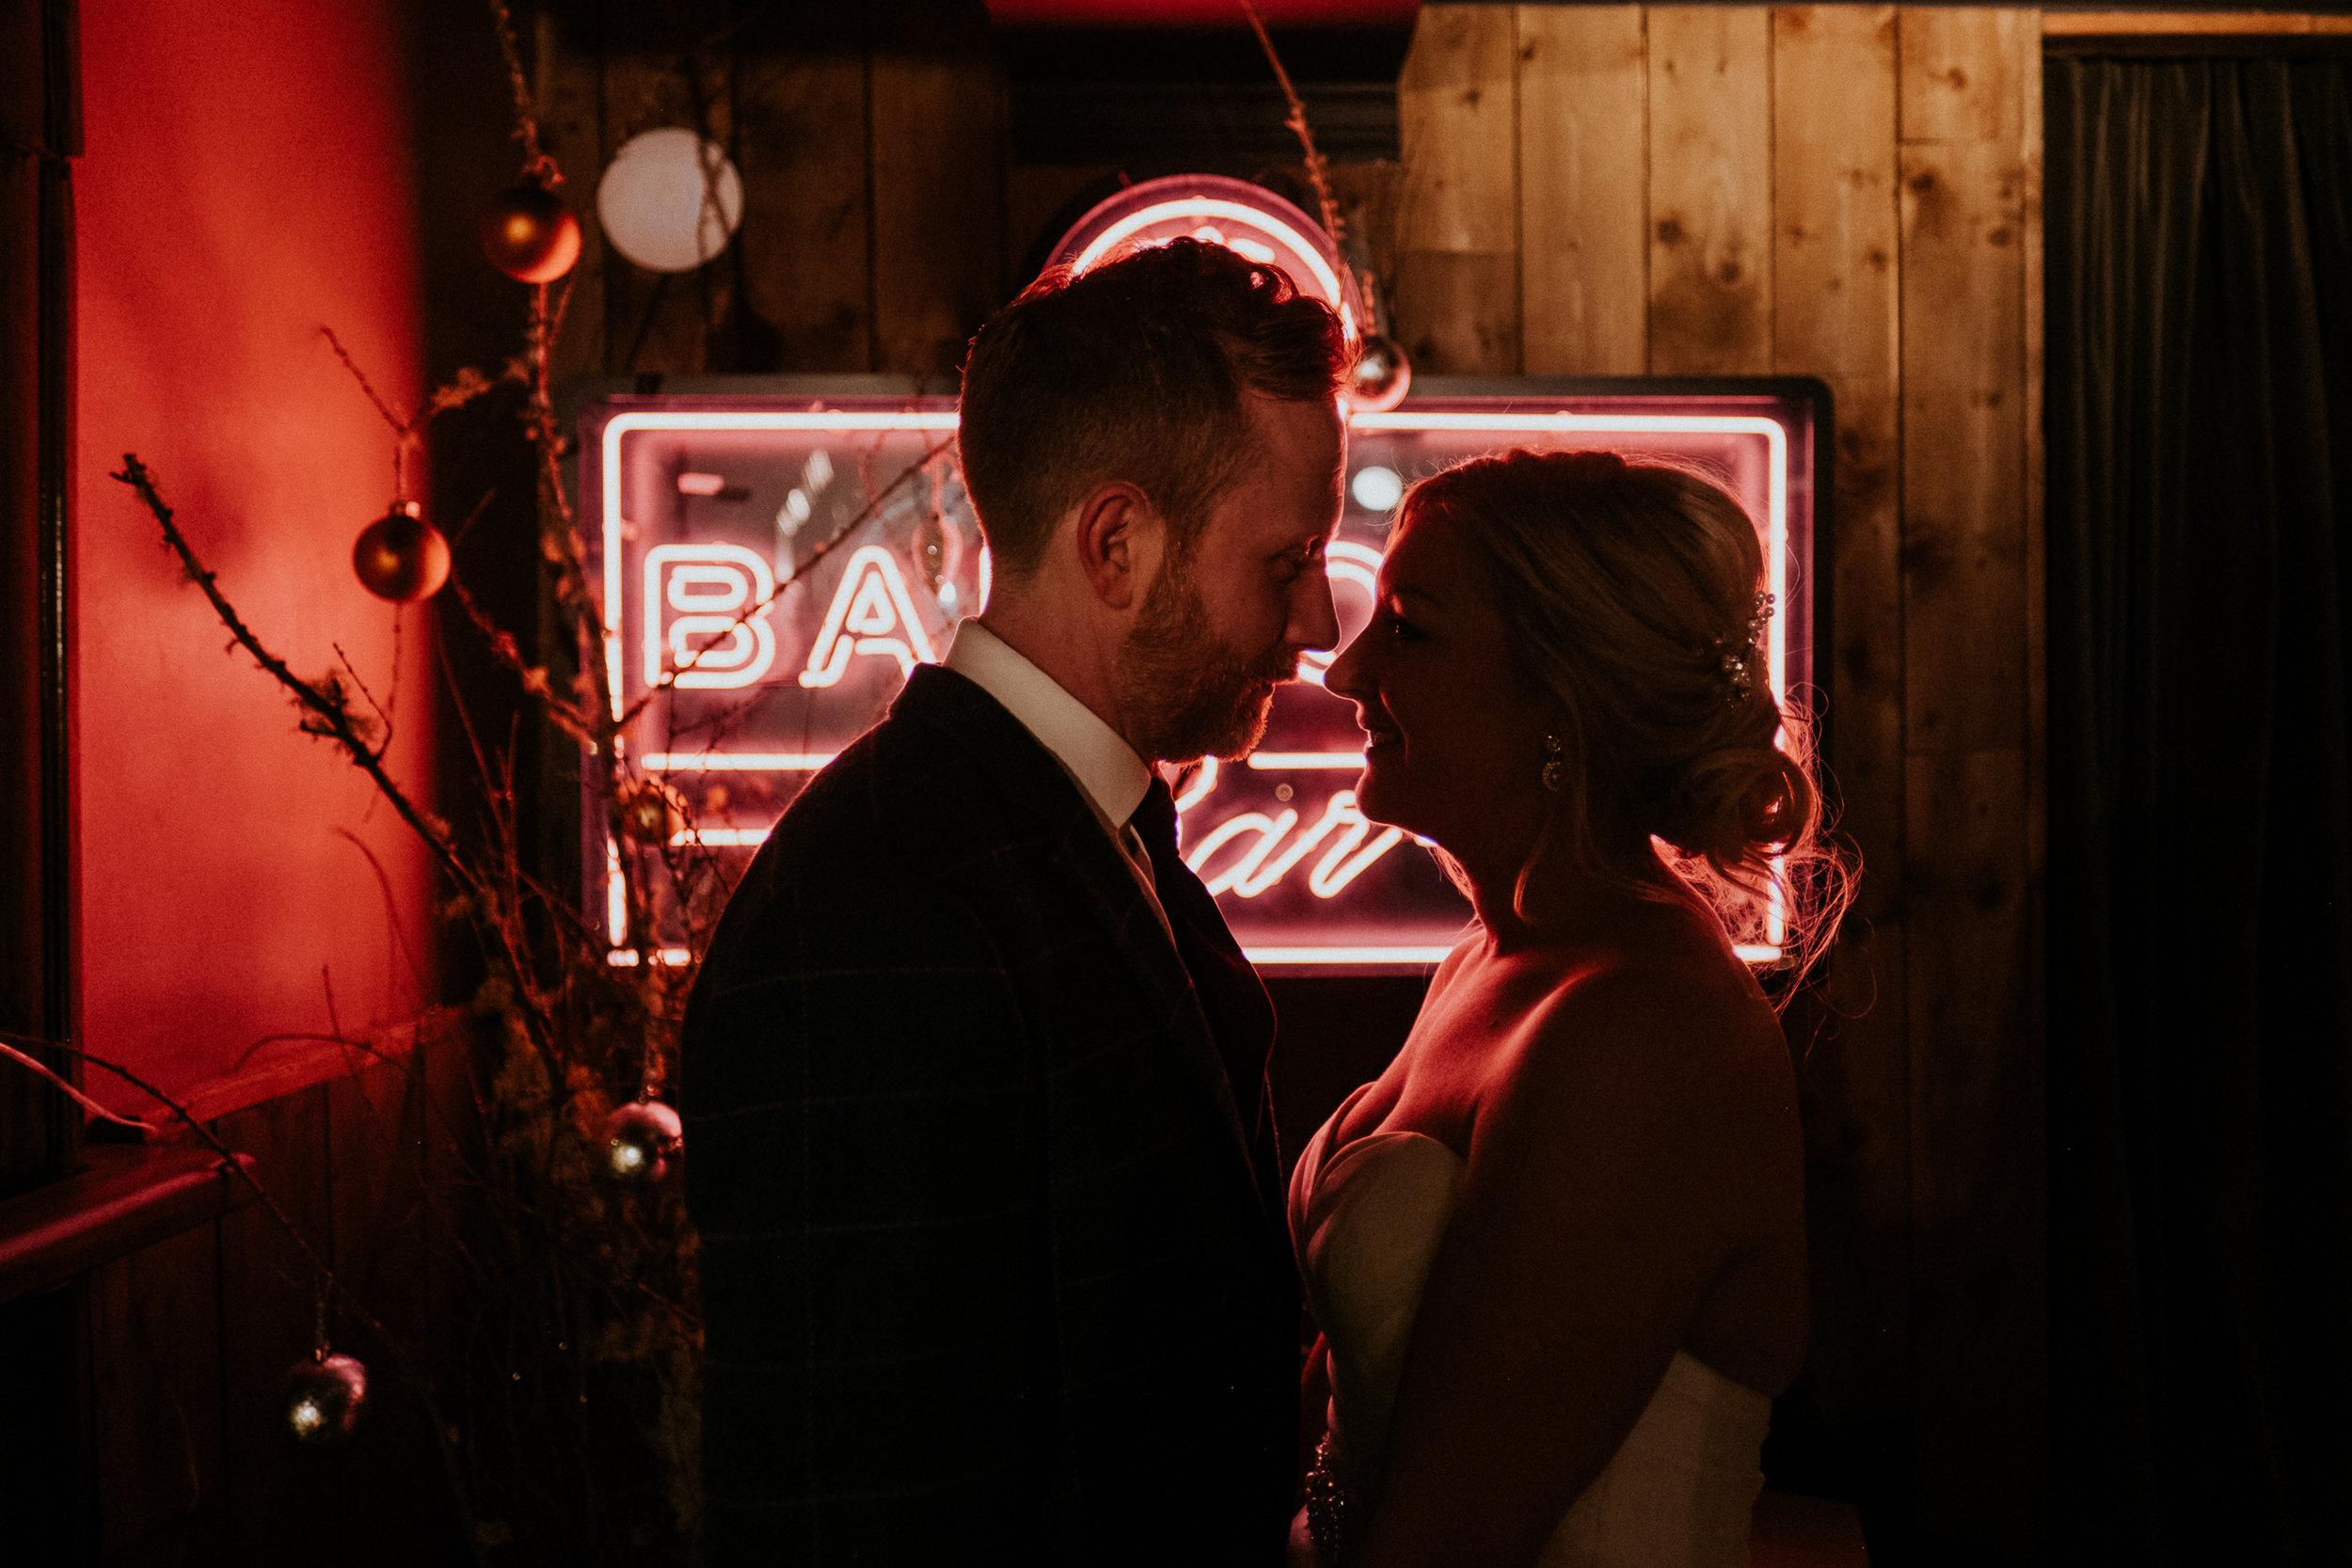 49 London Wedding Winter Christmas Asylum Chapel Photography St Barts Brewery Joanna nicole Photography4.jpg